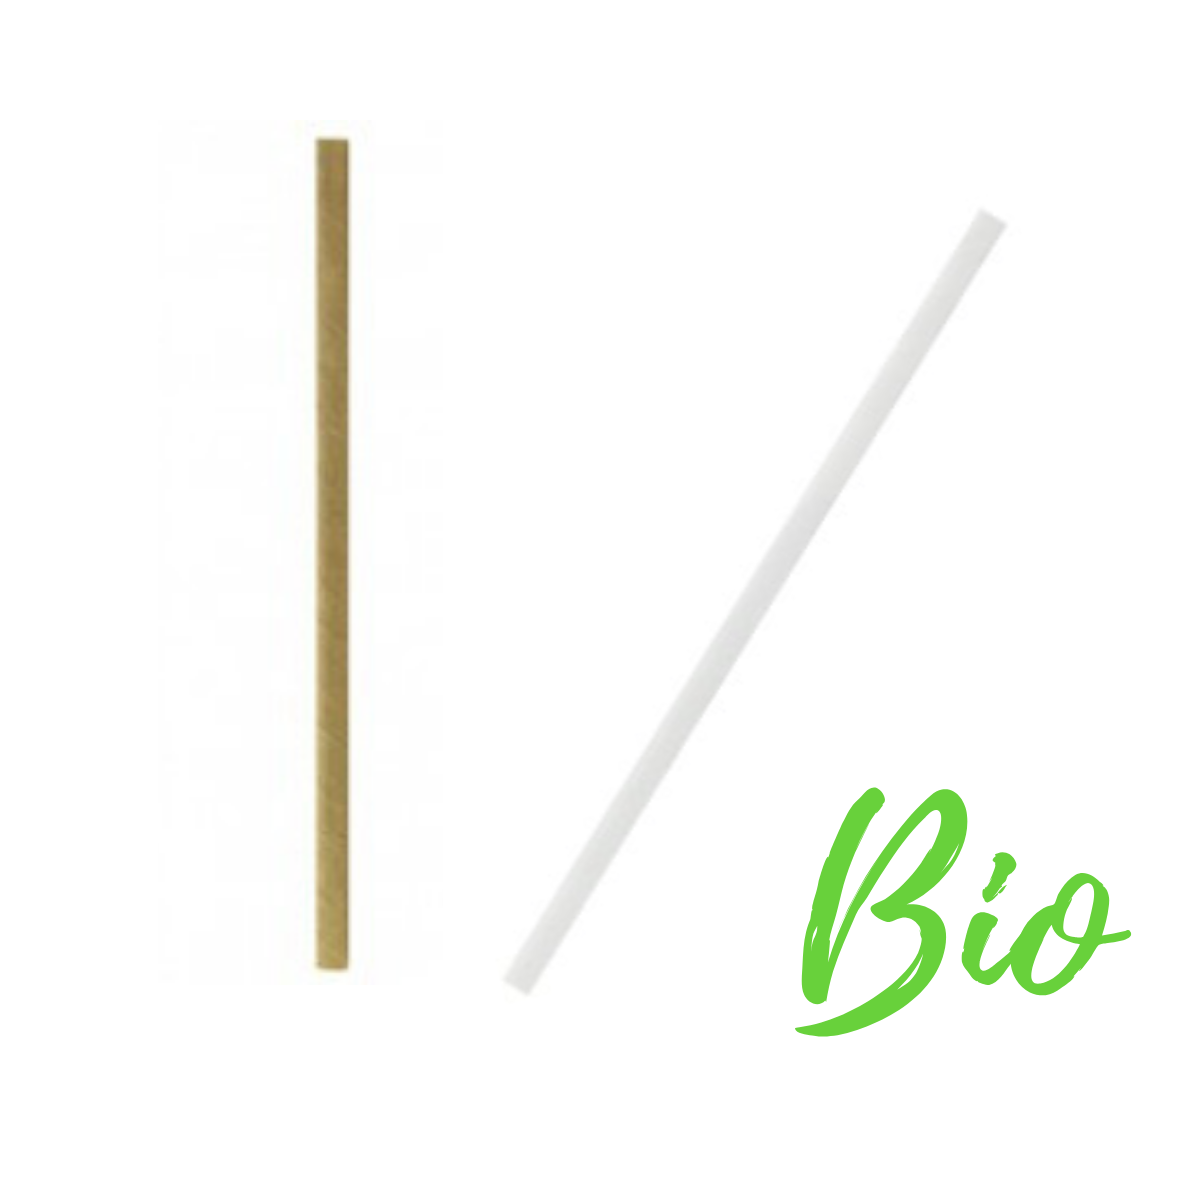 cannucce-carta-bio-gruppo